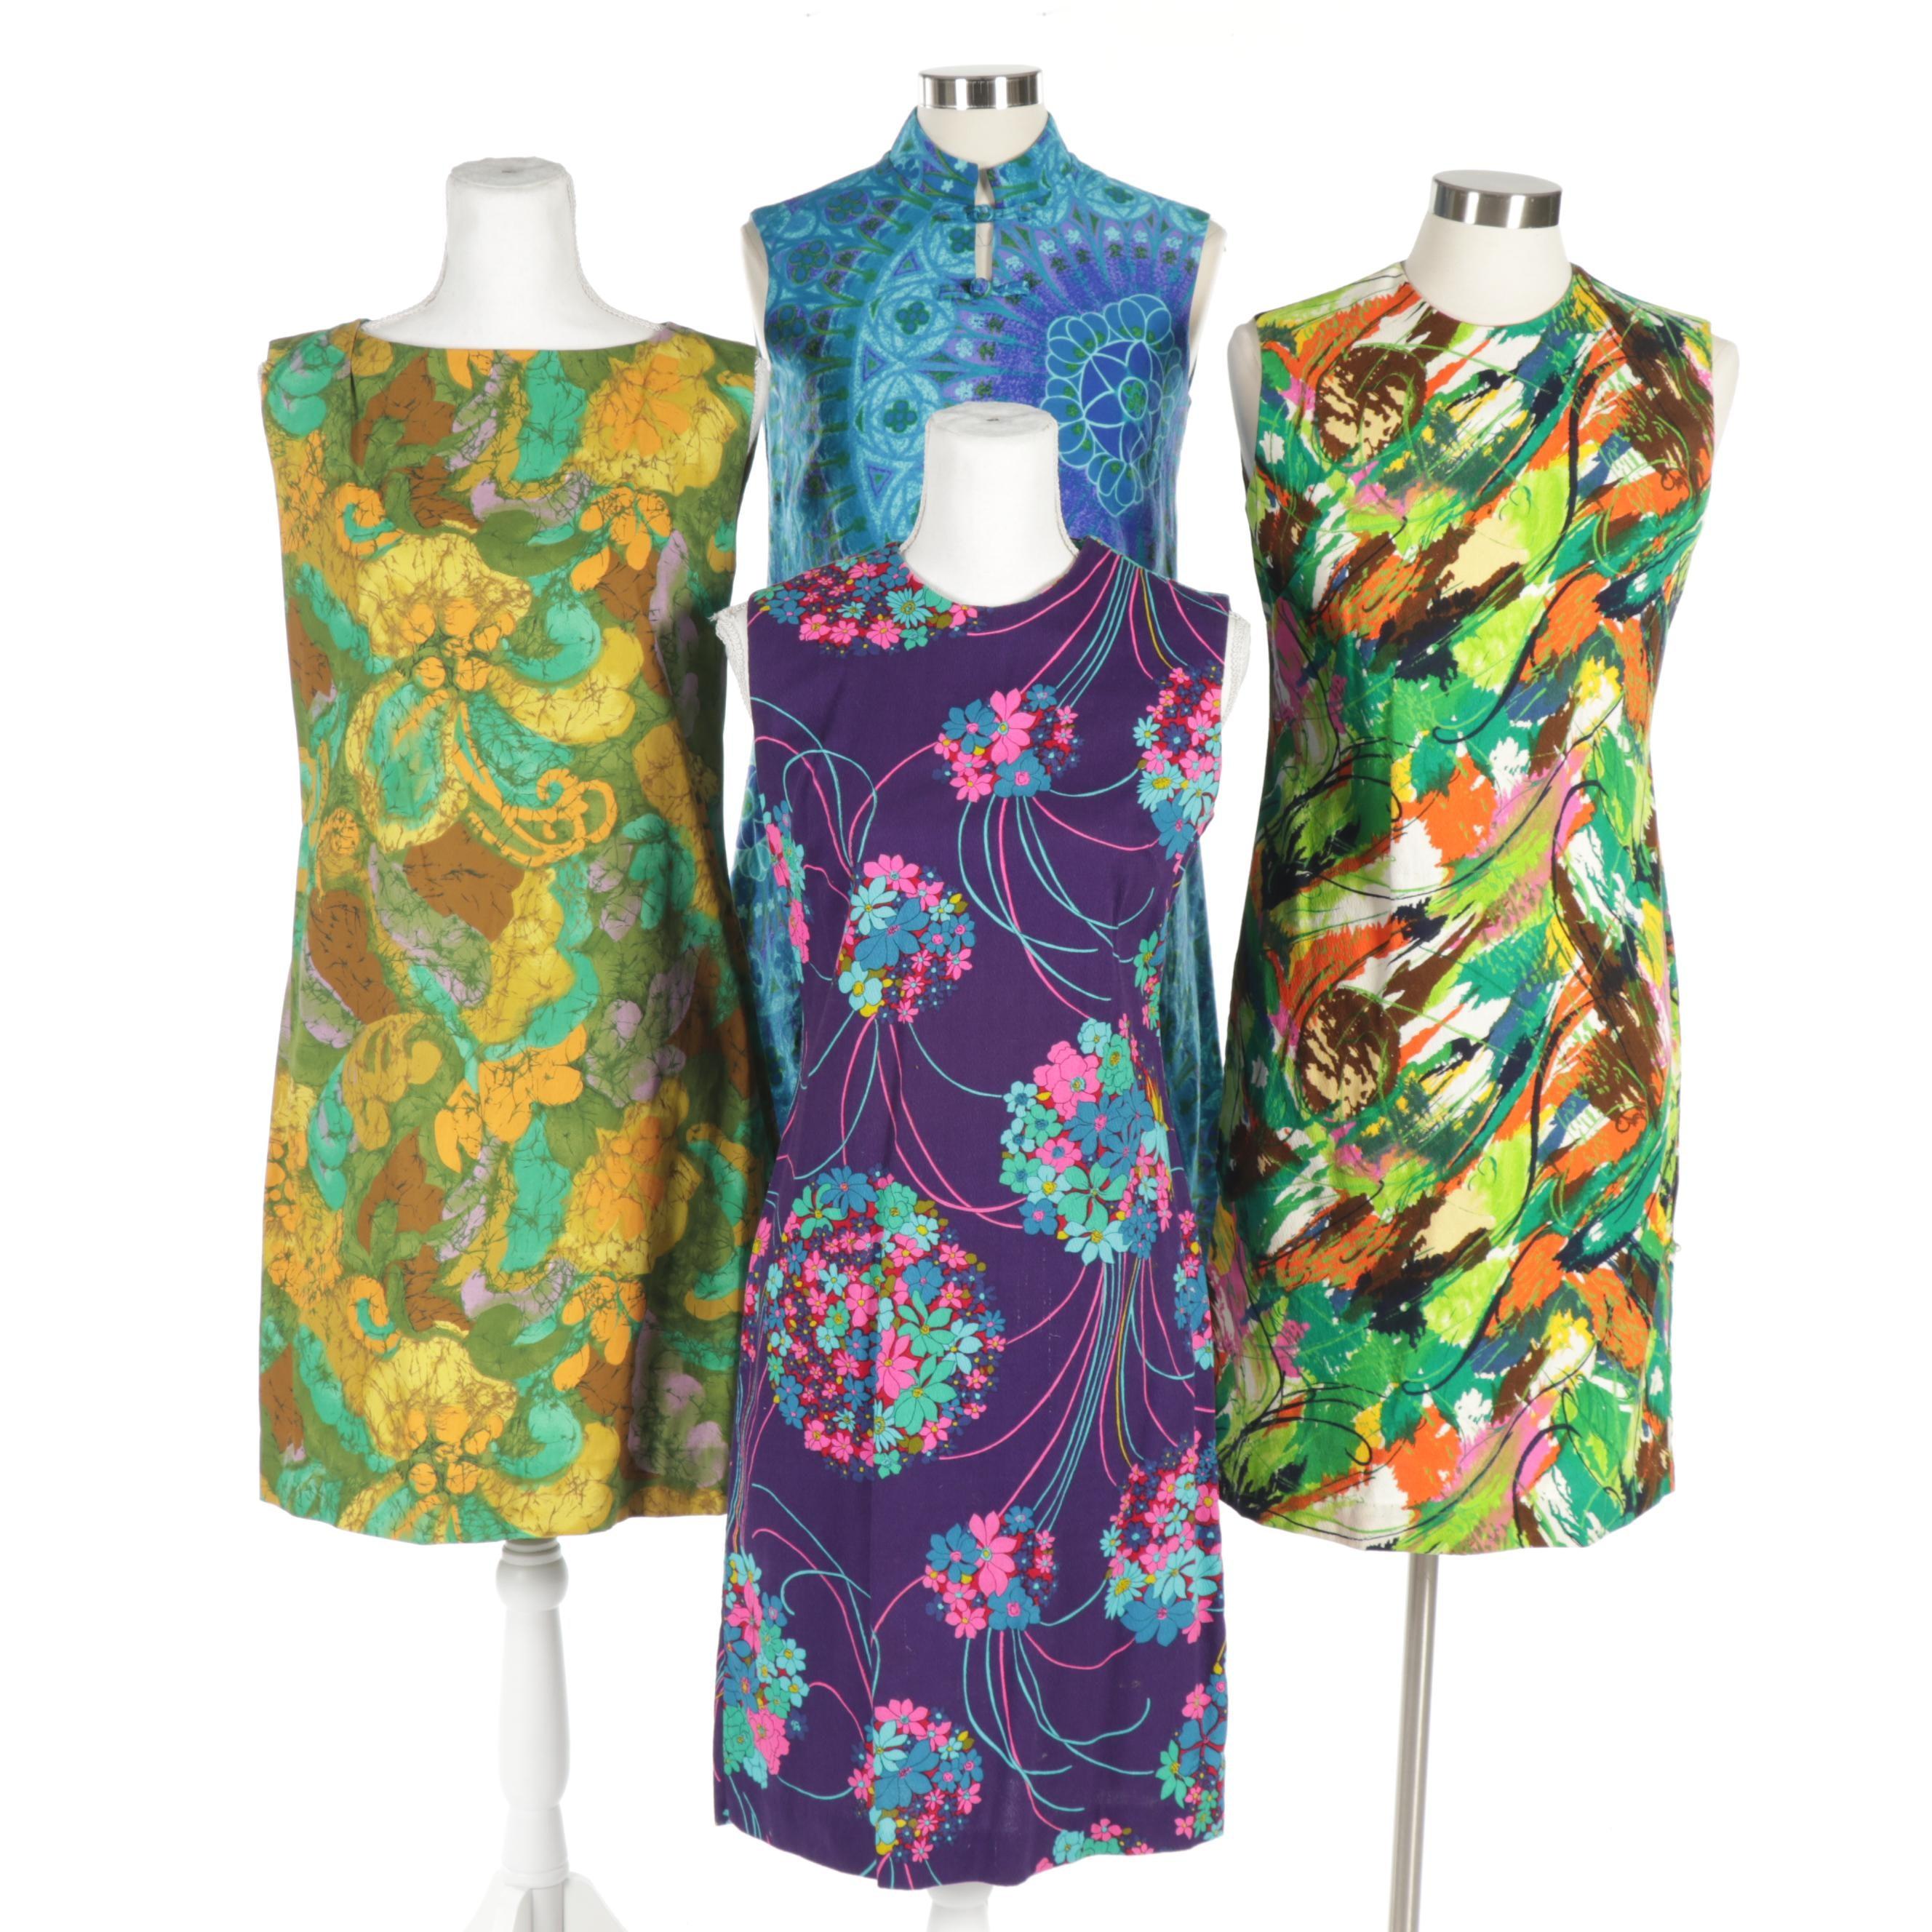 Women's John Abbott, HKC and Other Print Sleeveless Dresses, Circa 1960